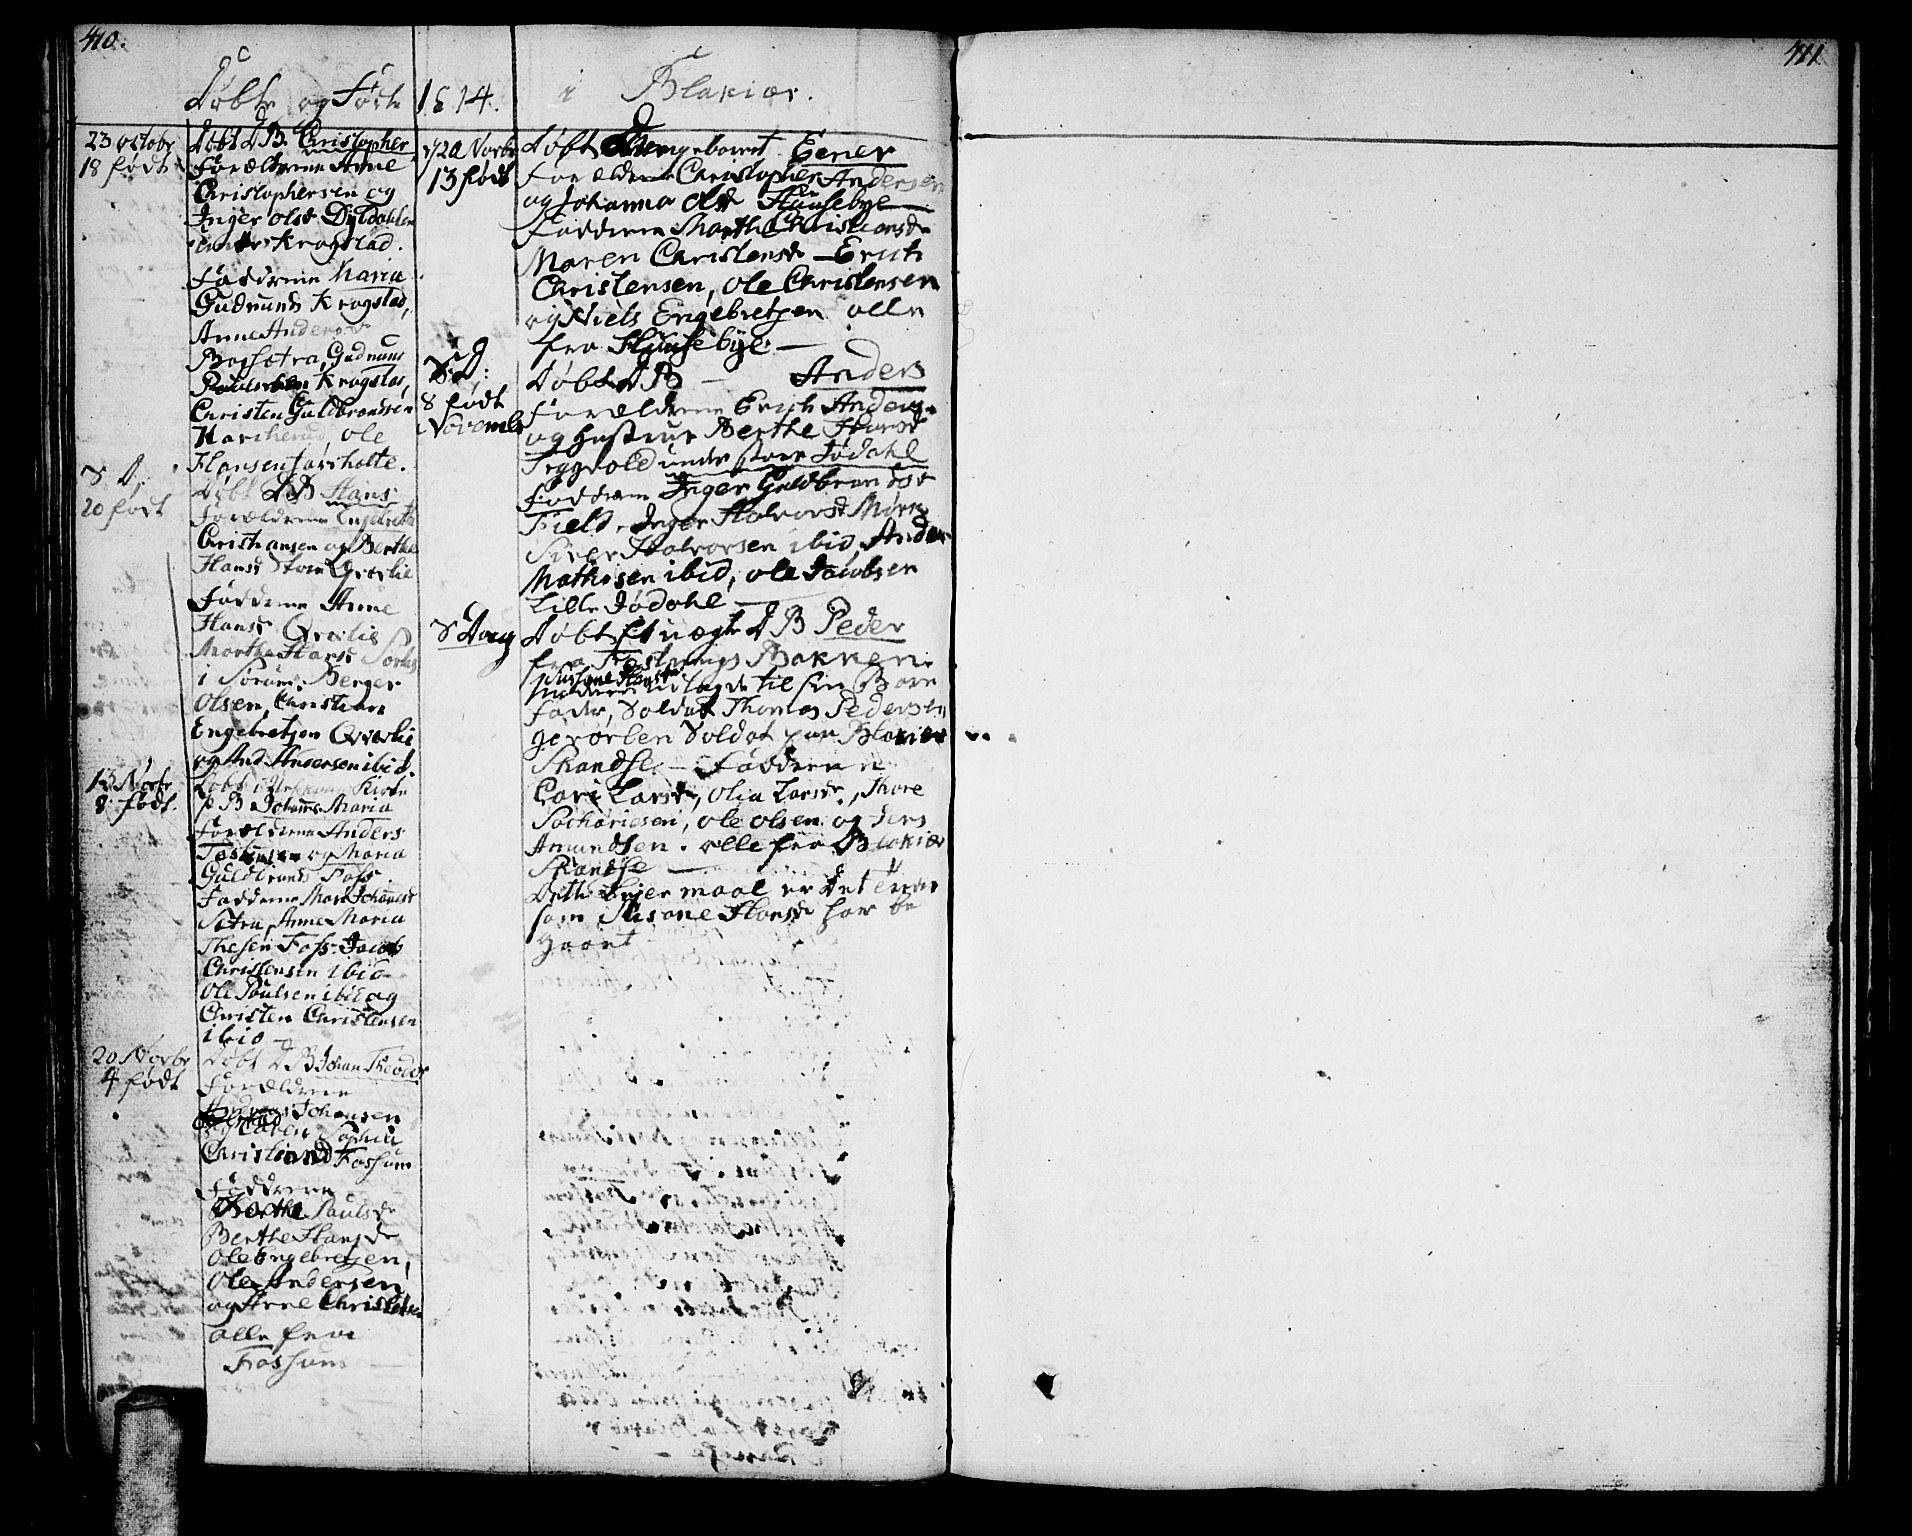 SAO, Aurskog prestekontor Kirkebøker, F/Fa/L0004: Ministerialbok nr. I 4, 1807-1814, s. 410-411